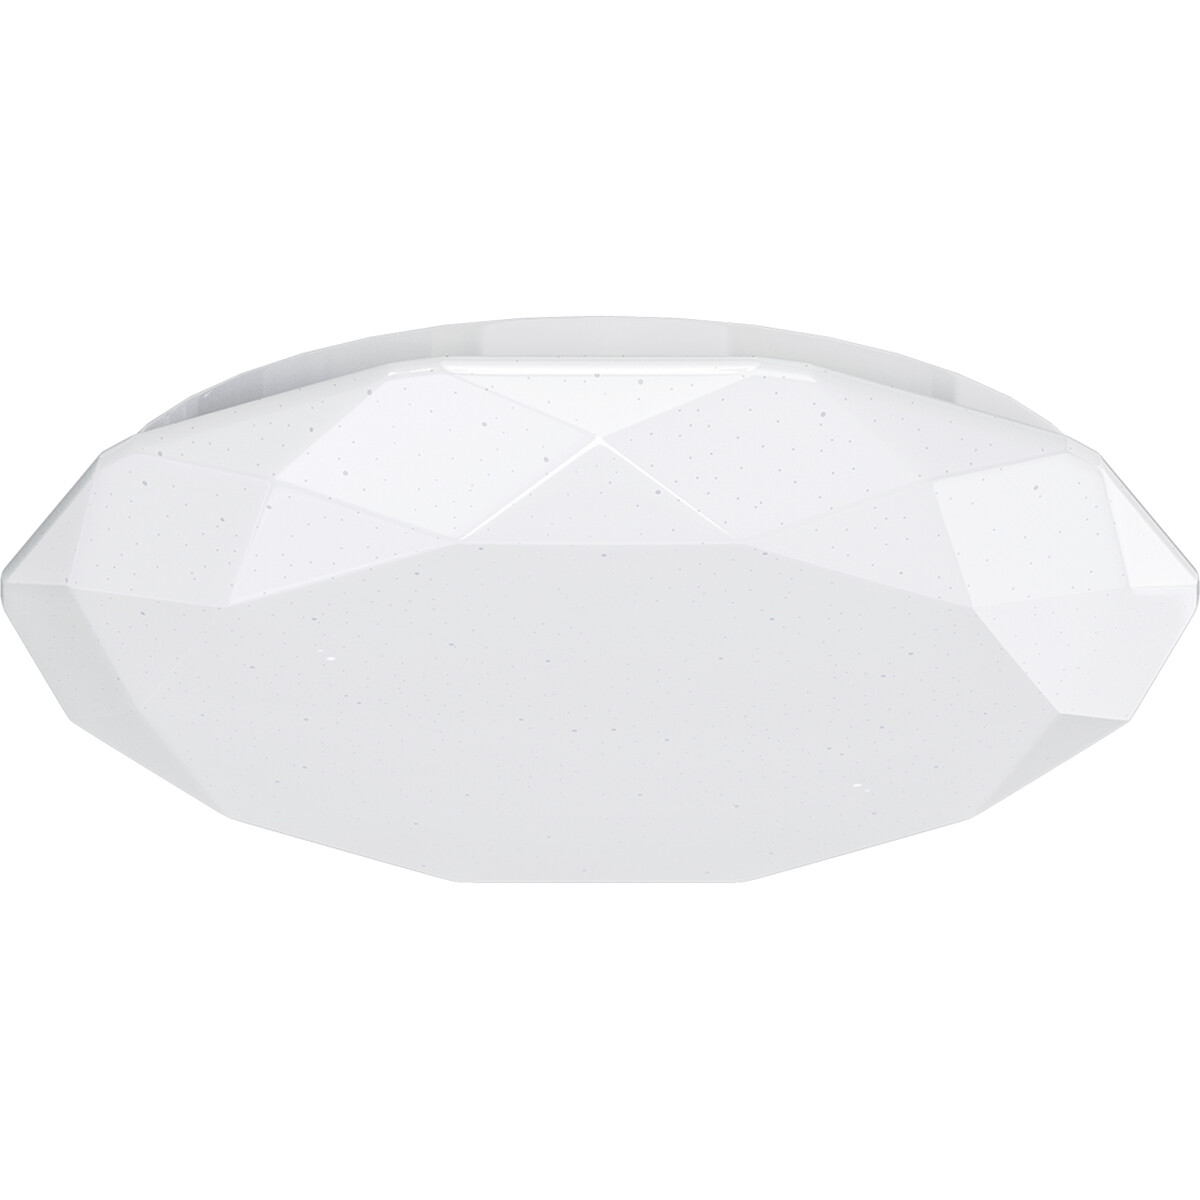 LED Plafondlamp - Aigi Dian - Opbouw Rond 20W - Helder/Koud Wit 6500K - Mat Wit - Aluminium